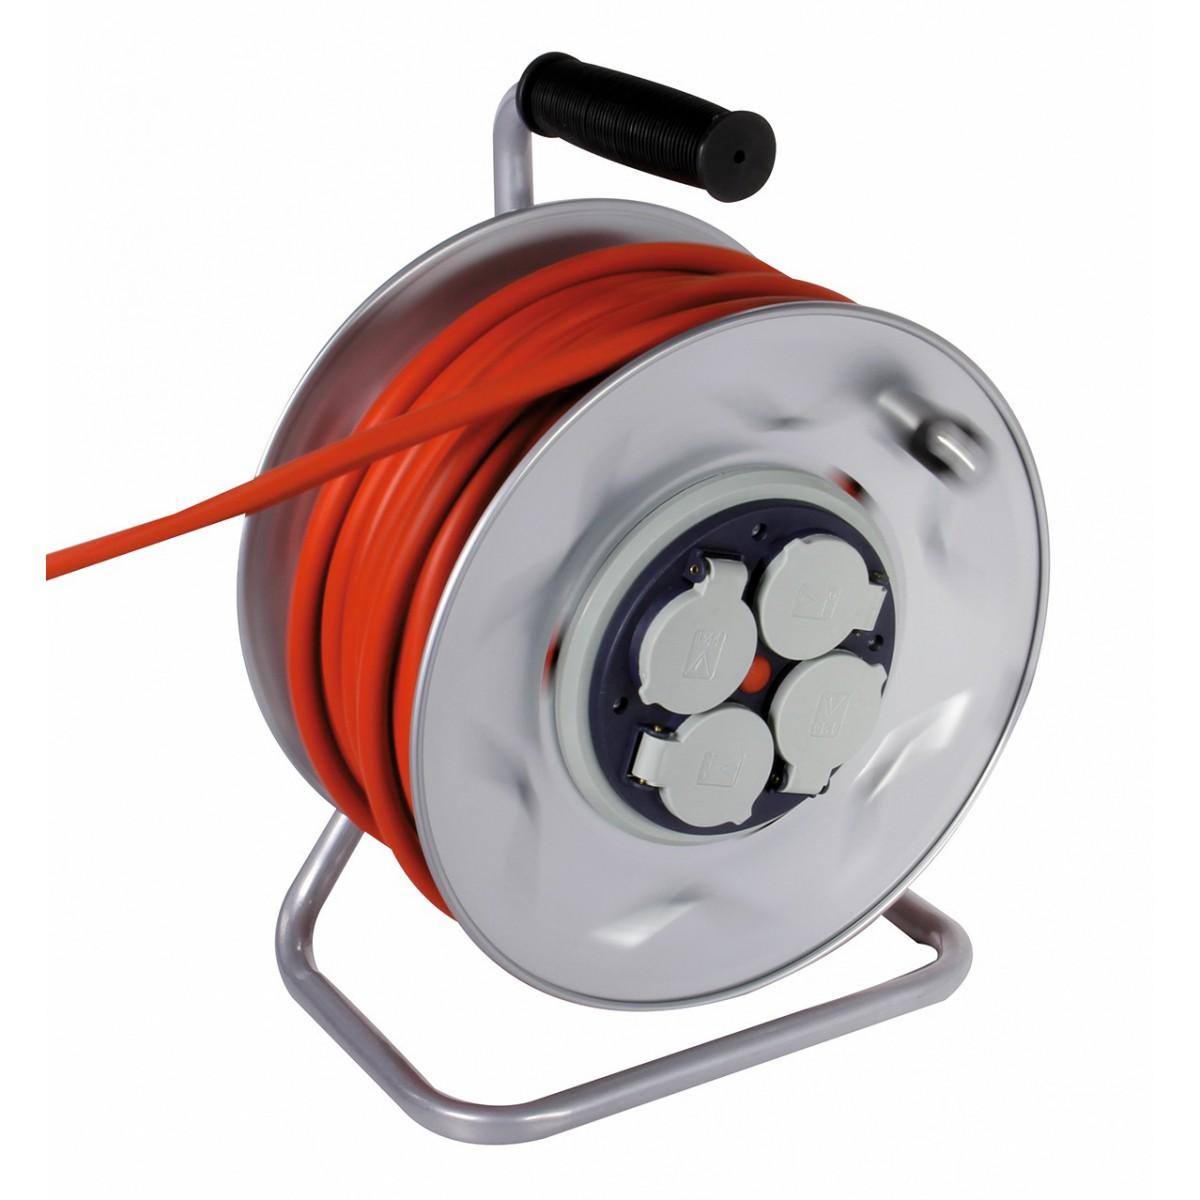 Enrouleur professionnel moyeu fixe Dhome - HO7 RN-F 3G 2,5 mm² - Longueur 25 m